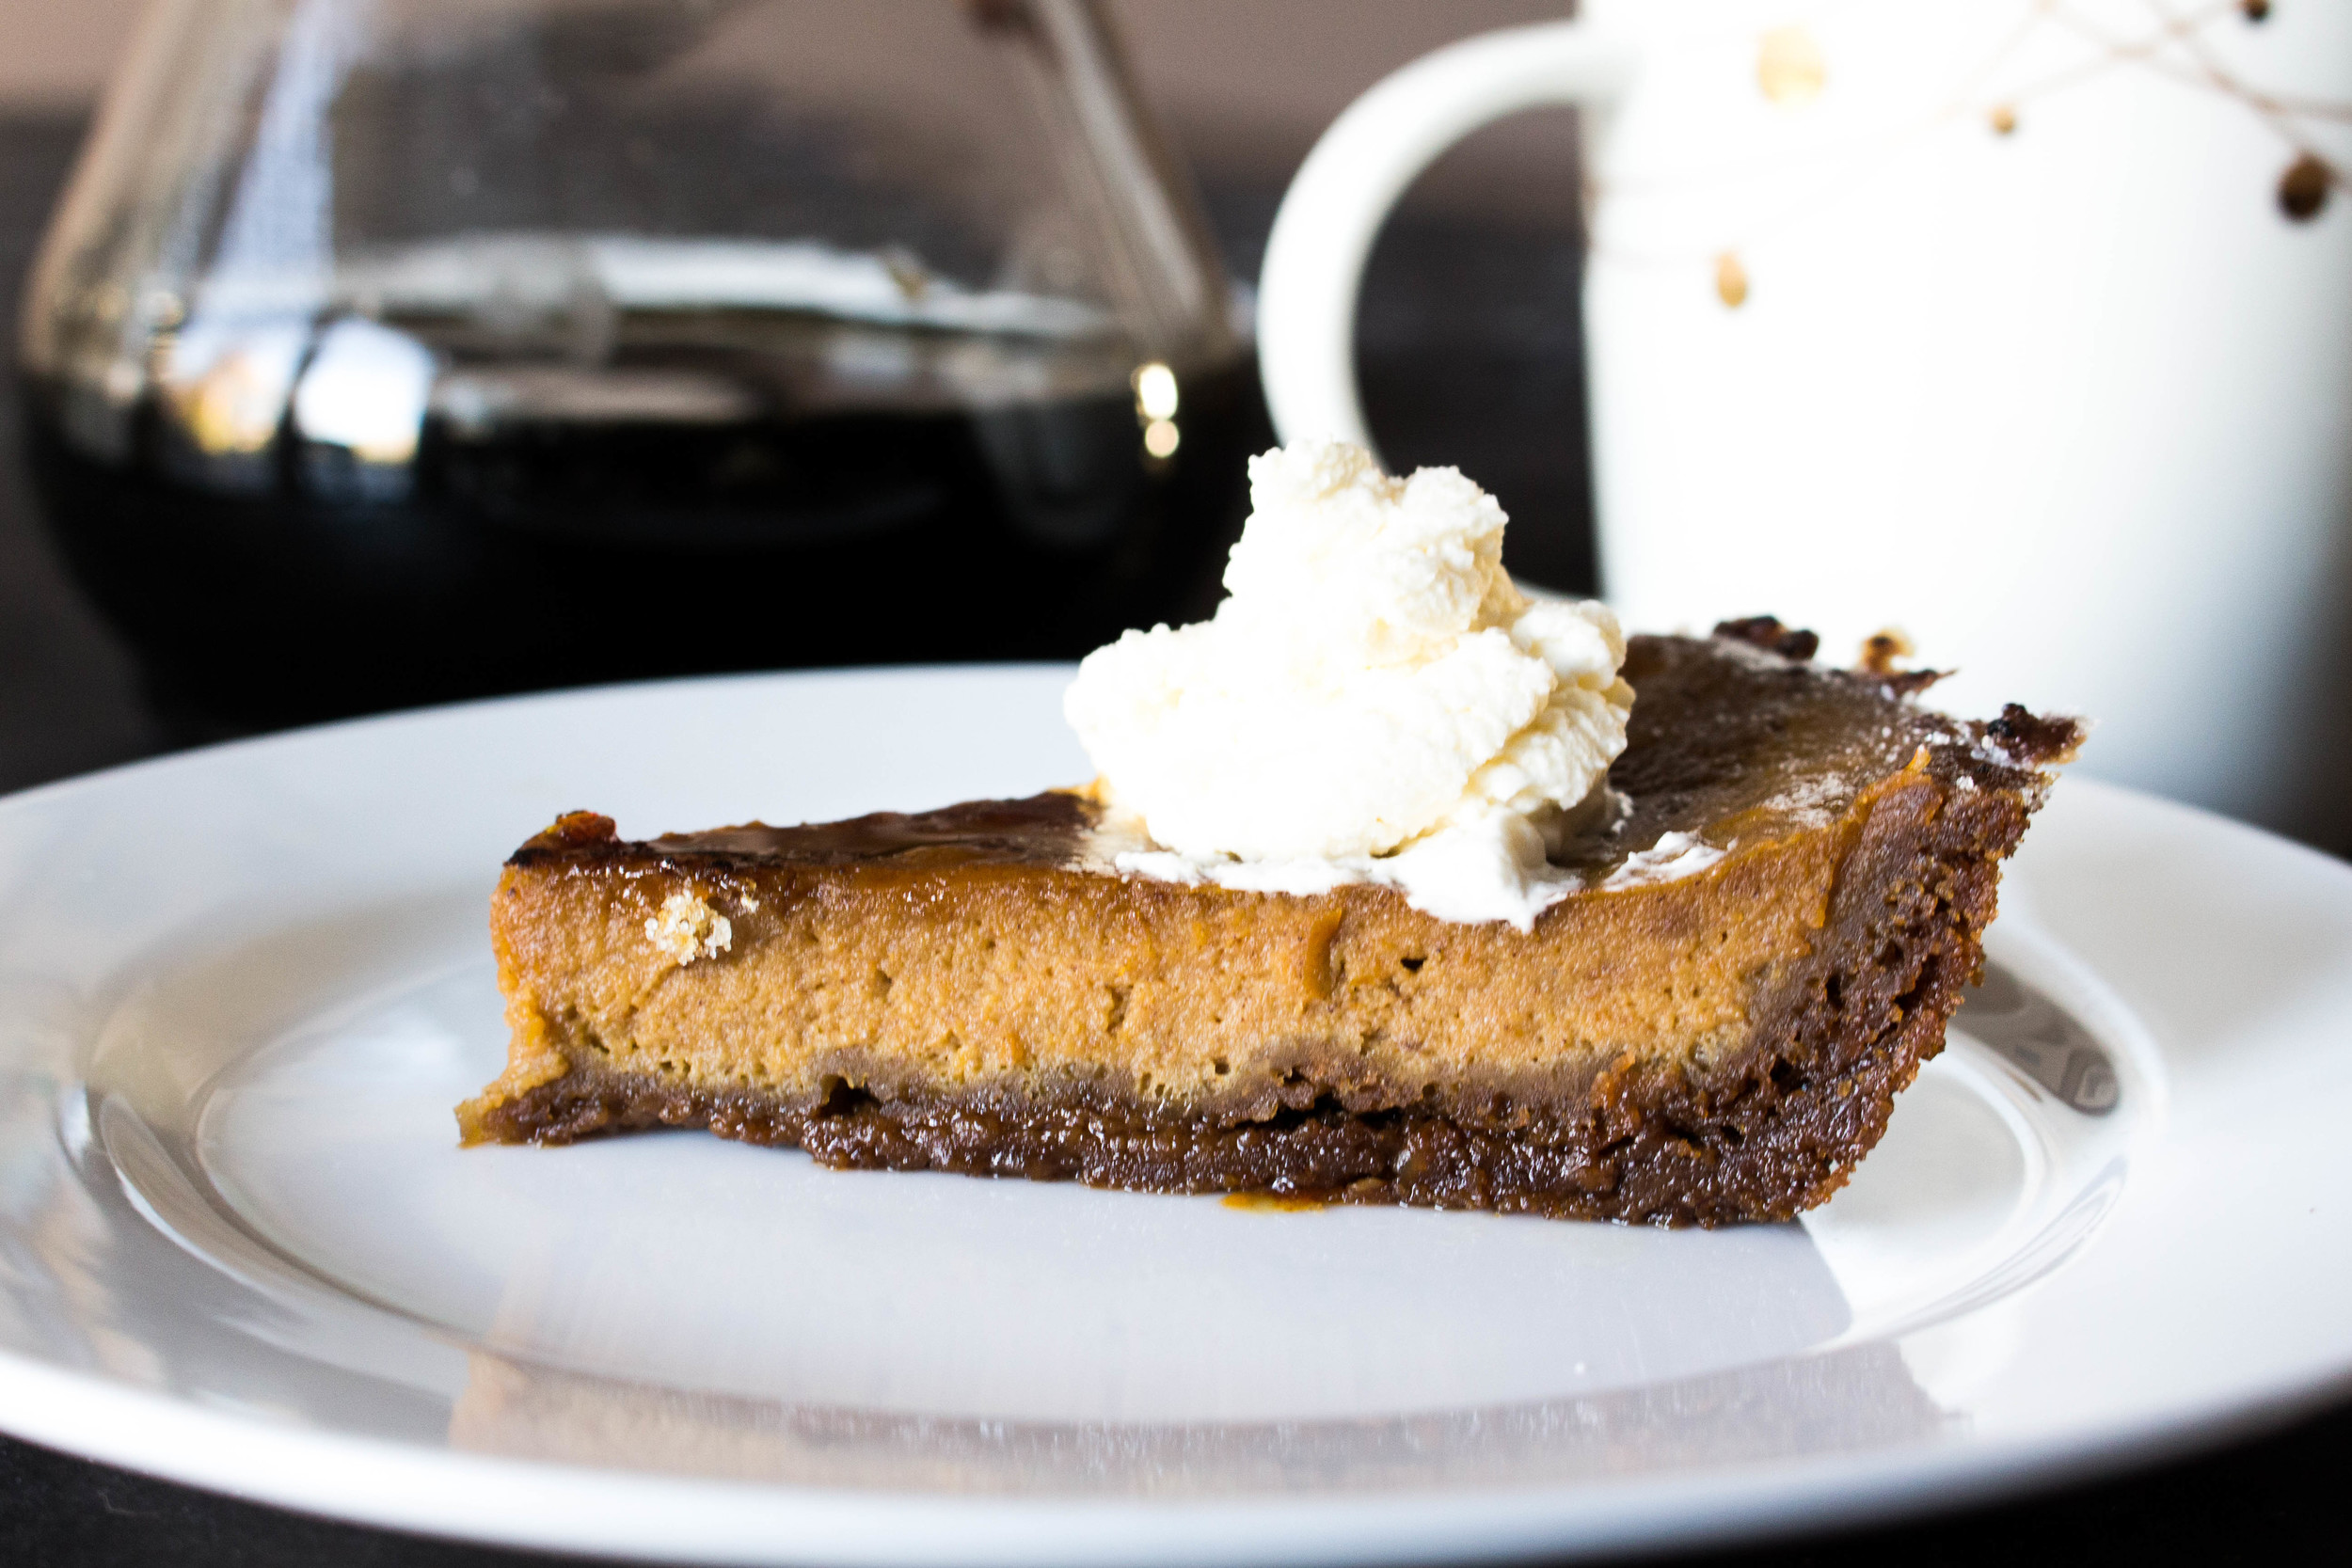 All of It - Brûléed Maple Pumpkin Pie with Gingersnap Crust